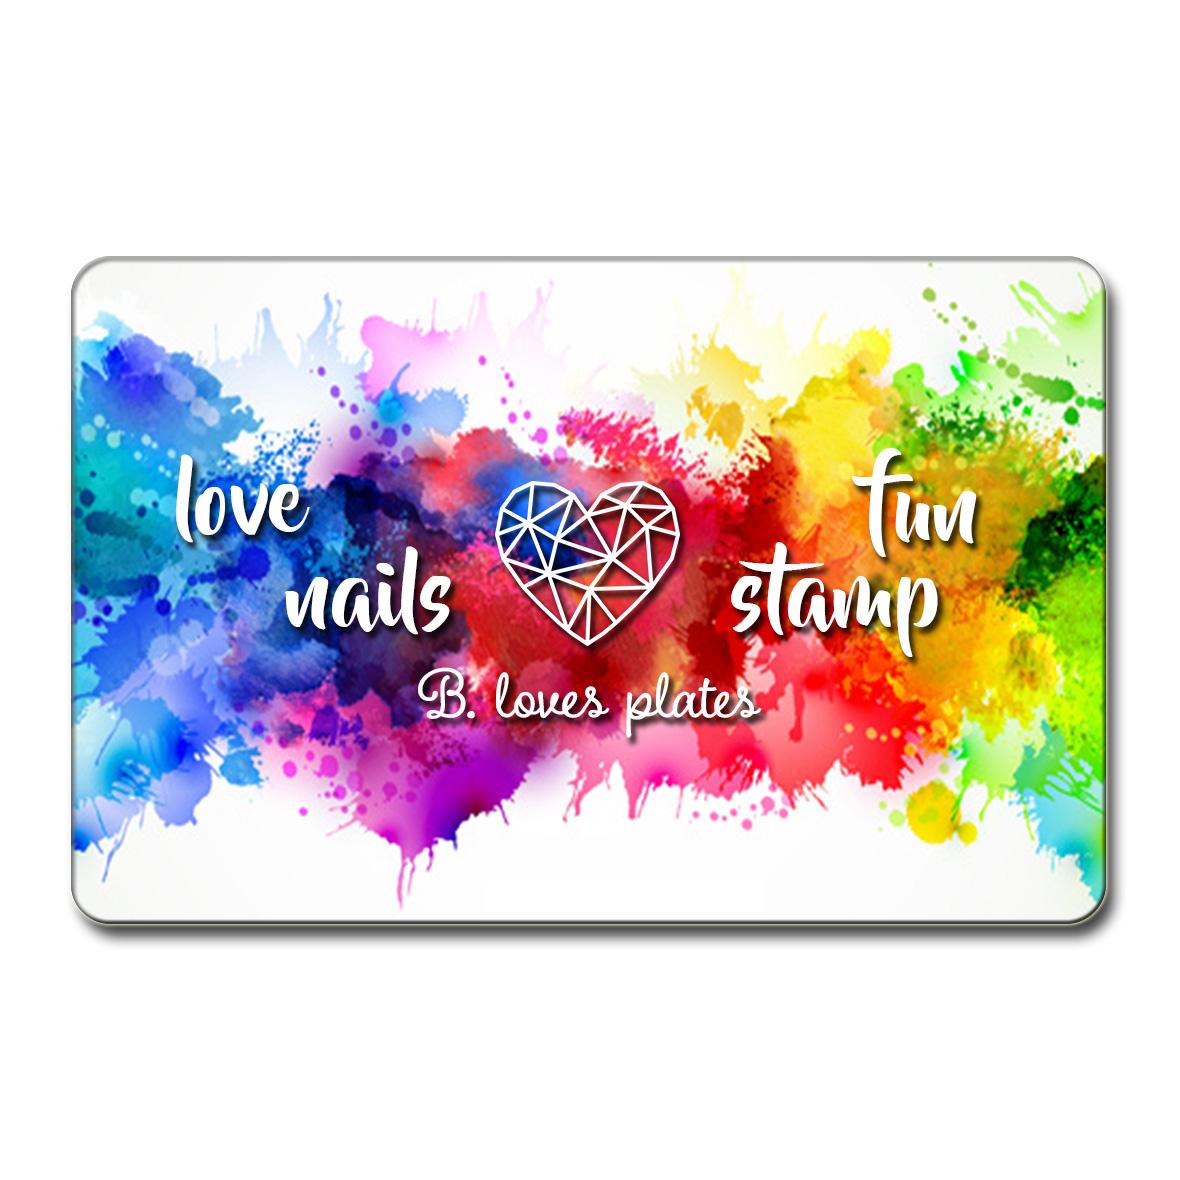 b-loves-plates-rainbow-scraper-zdrapka-plytki-stamping-nails-nail-art-stempelki-5